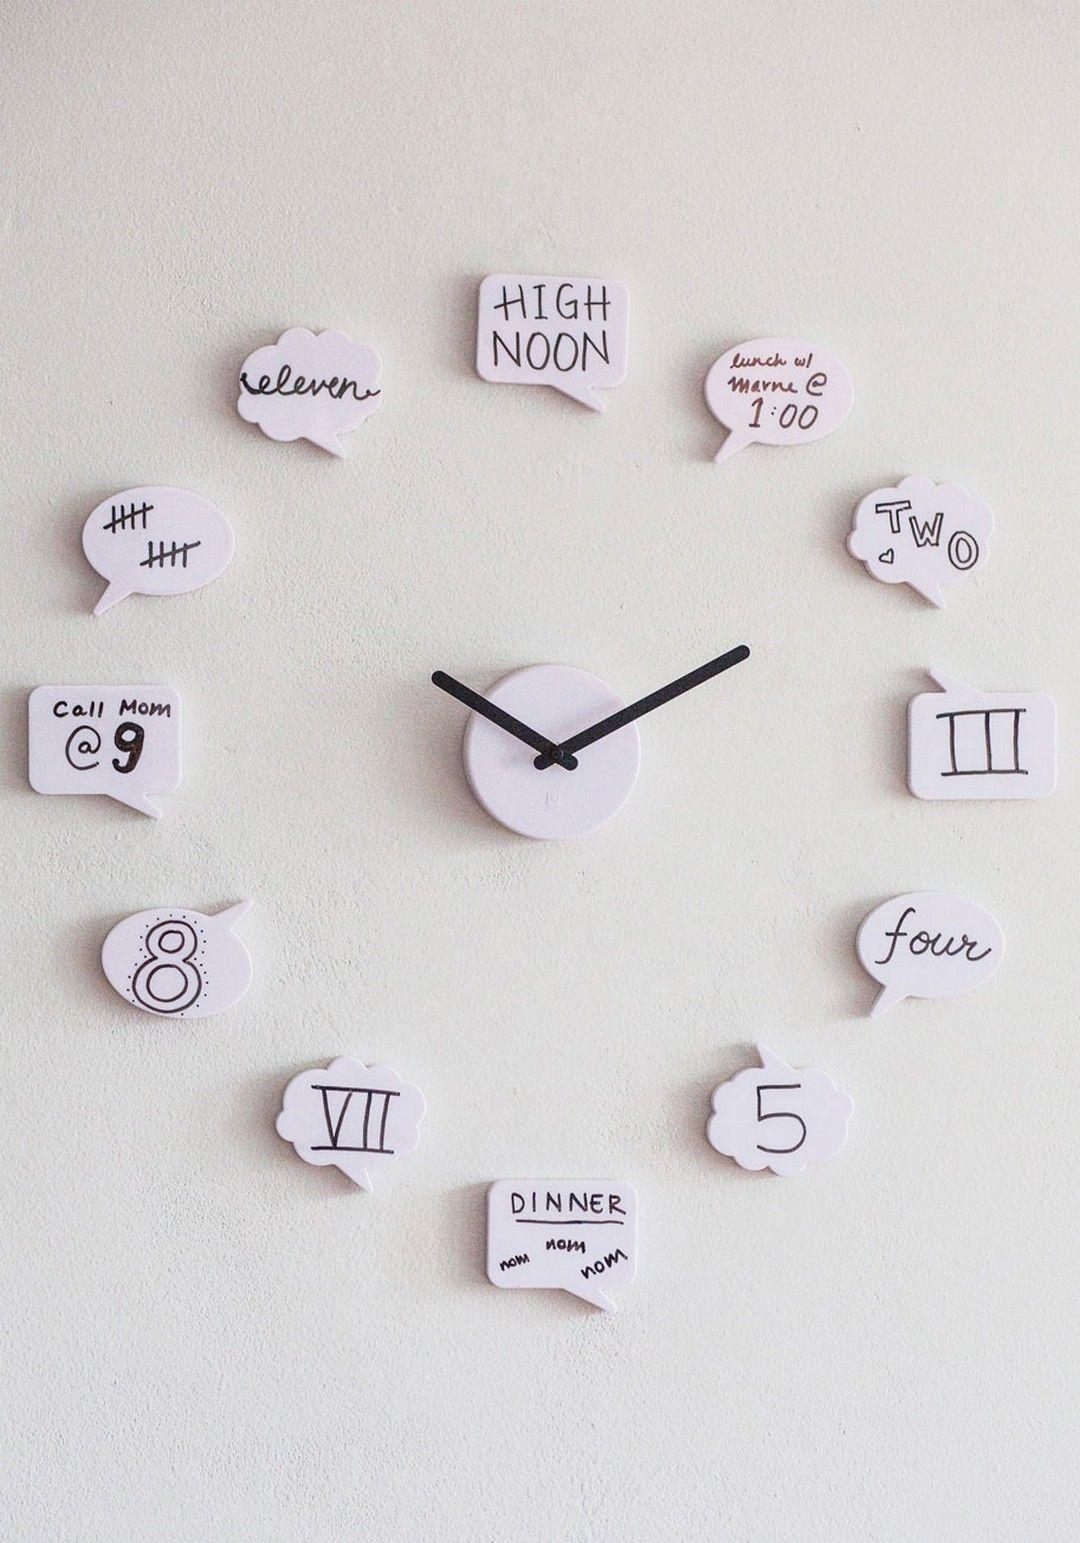 41 Astonishing Diy Wall Clock Ideas In 2020 Diy Clock Wall Wall Clock Design Easy Room Decor